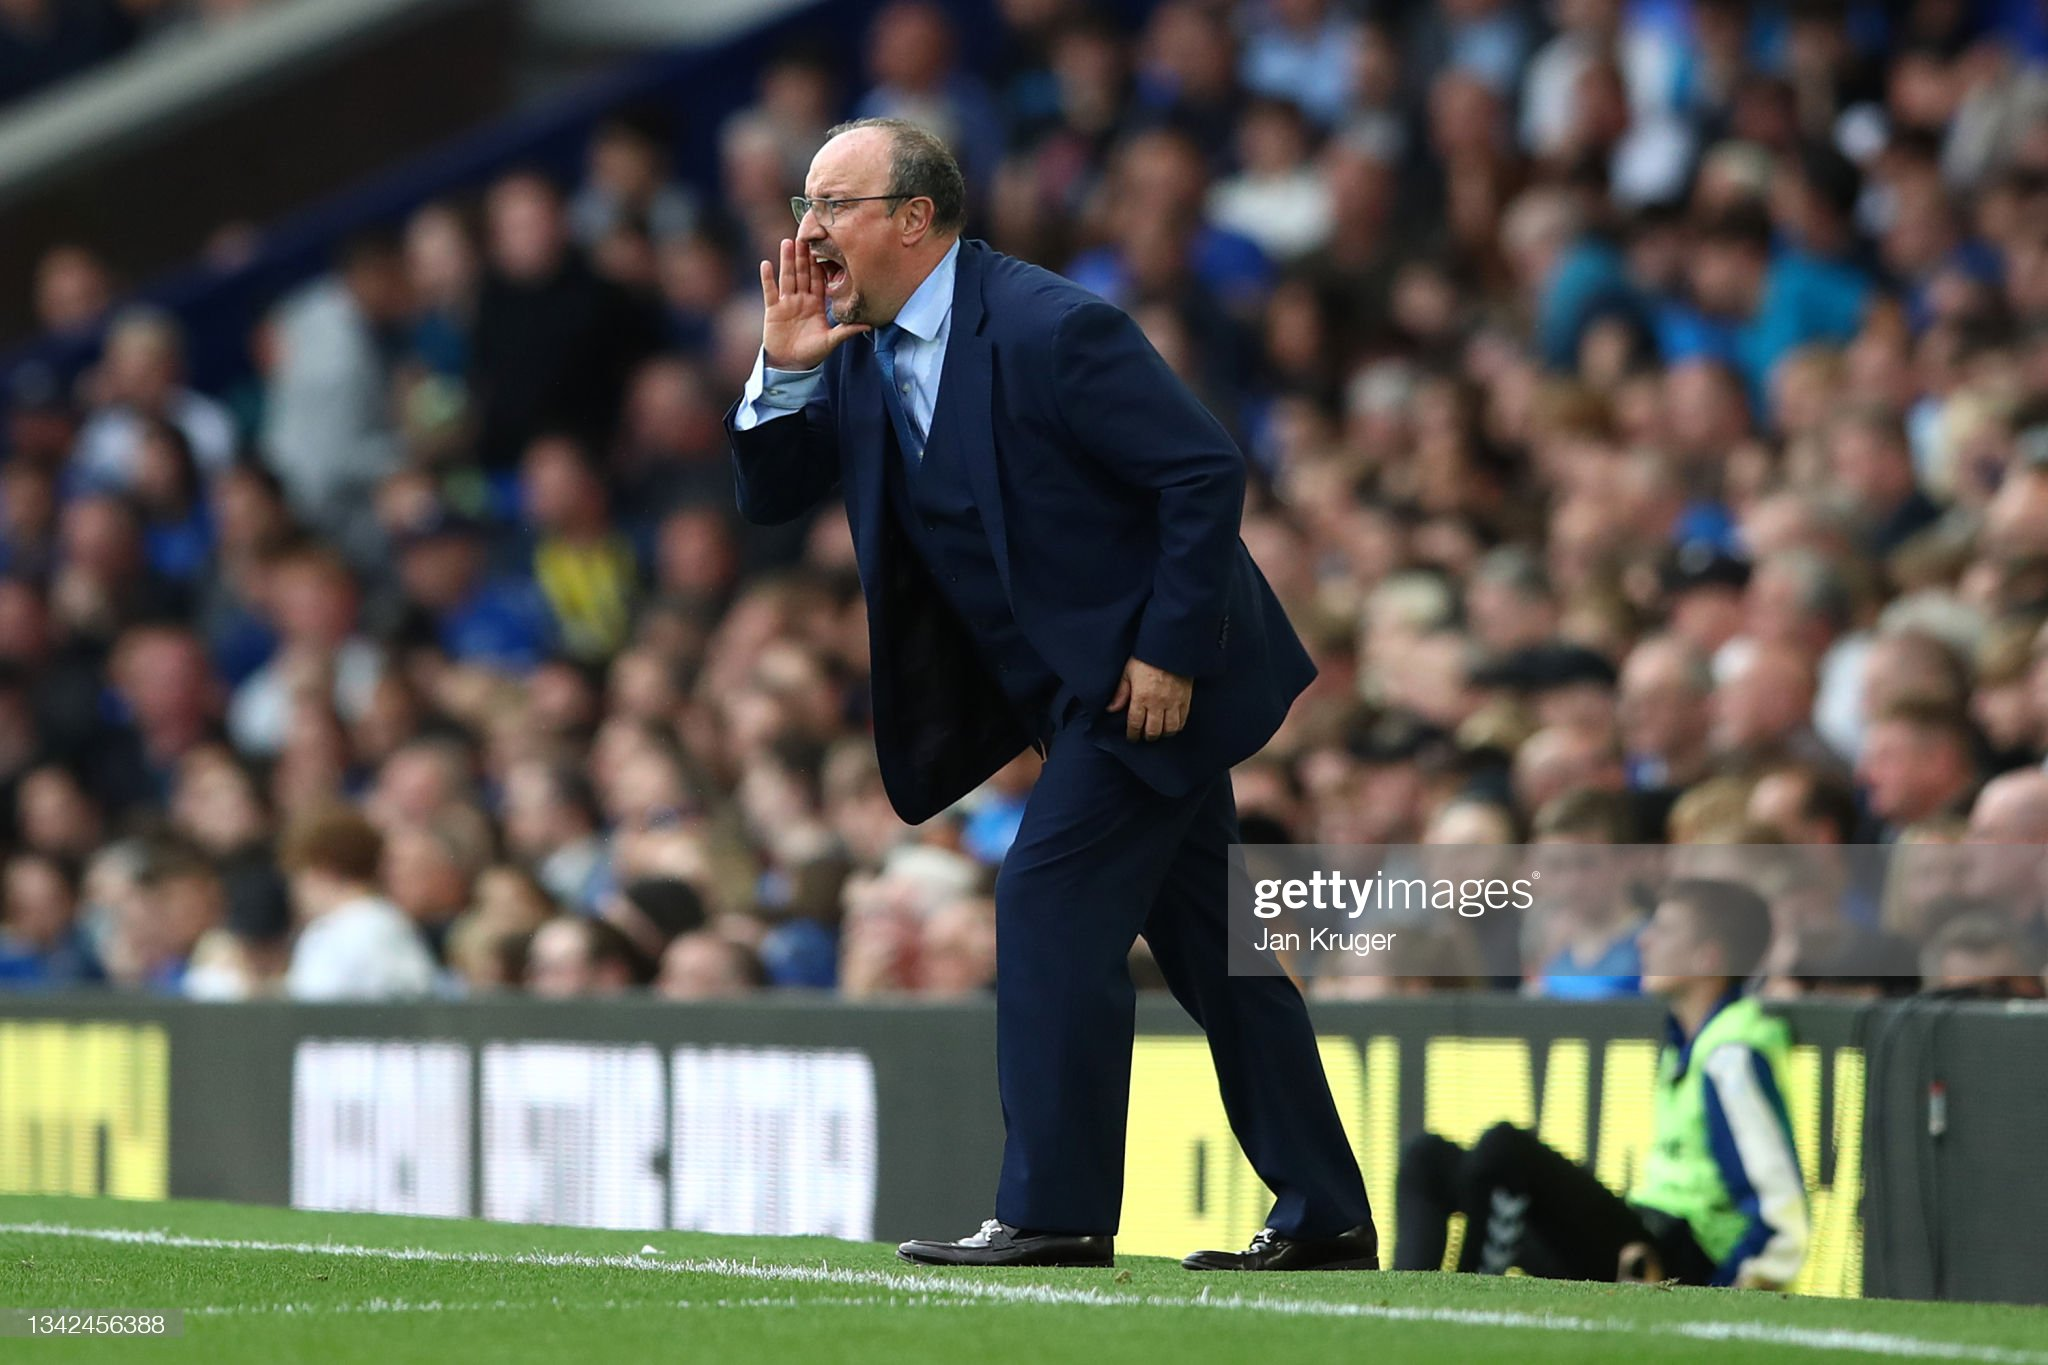 Rafa Benitez proving his doubters wrong at Everton